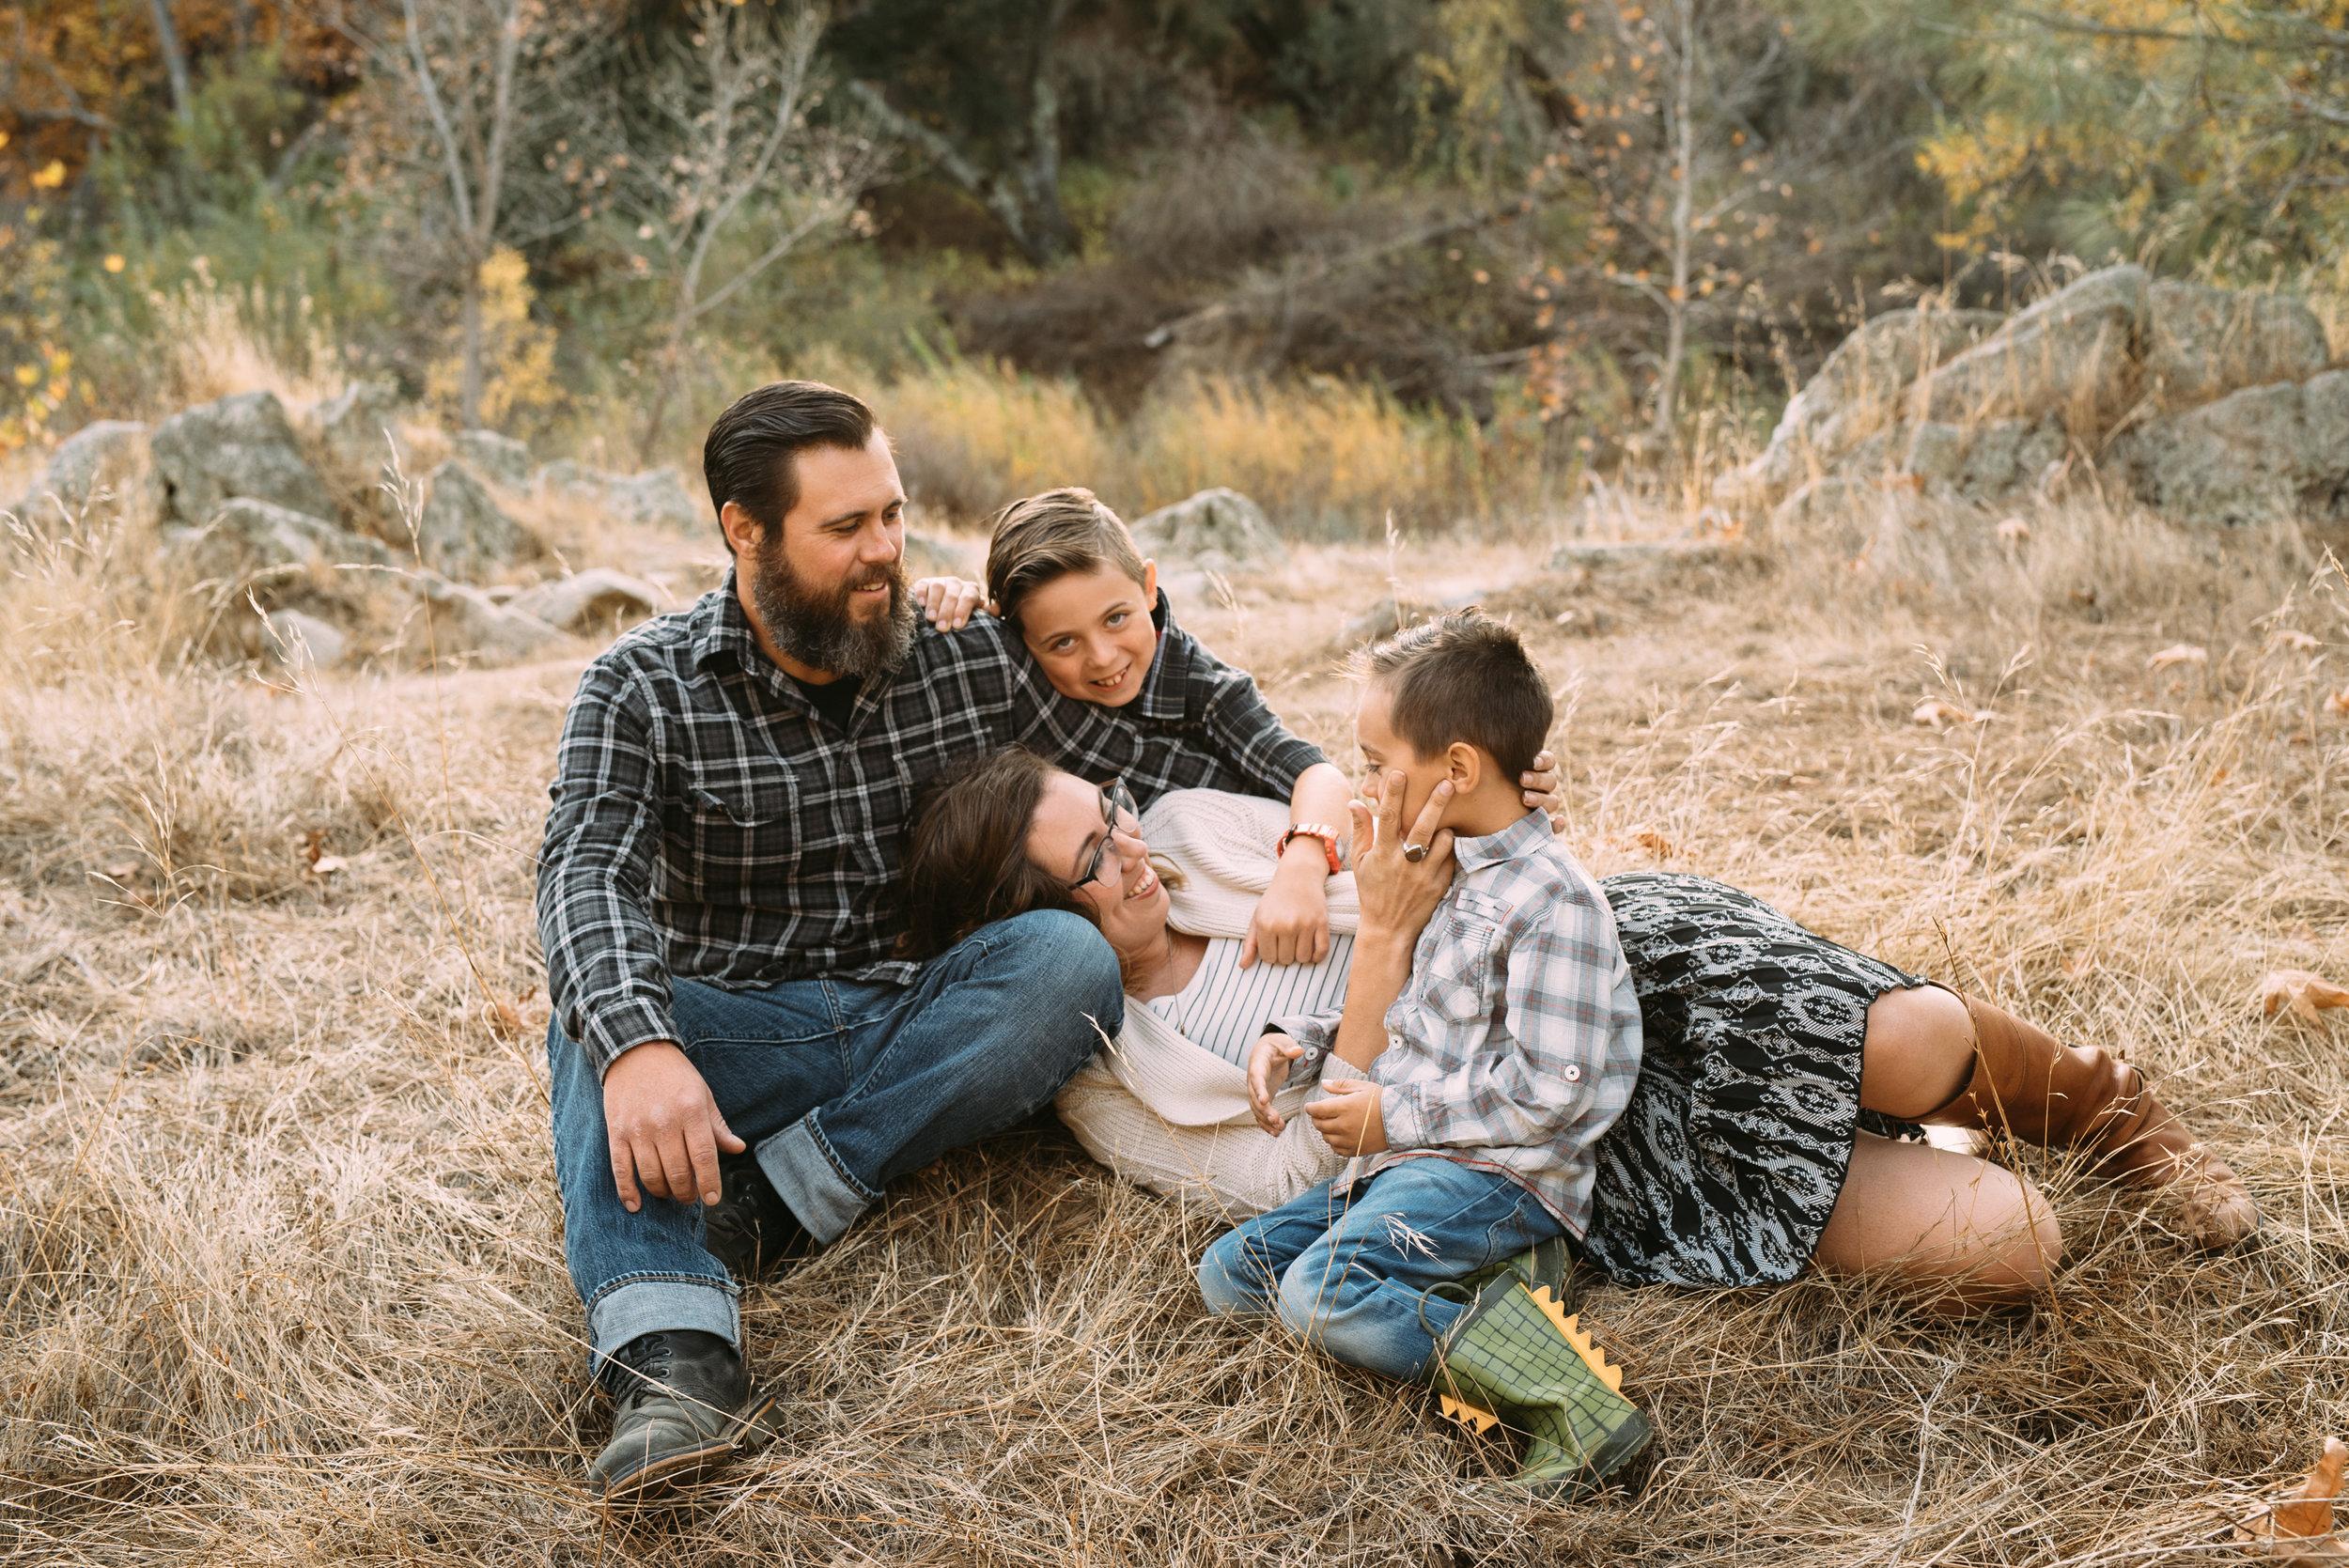 santamargaritafamily-5.jpg